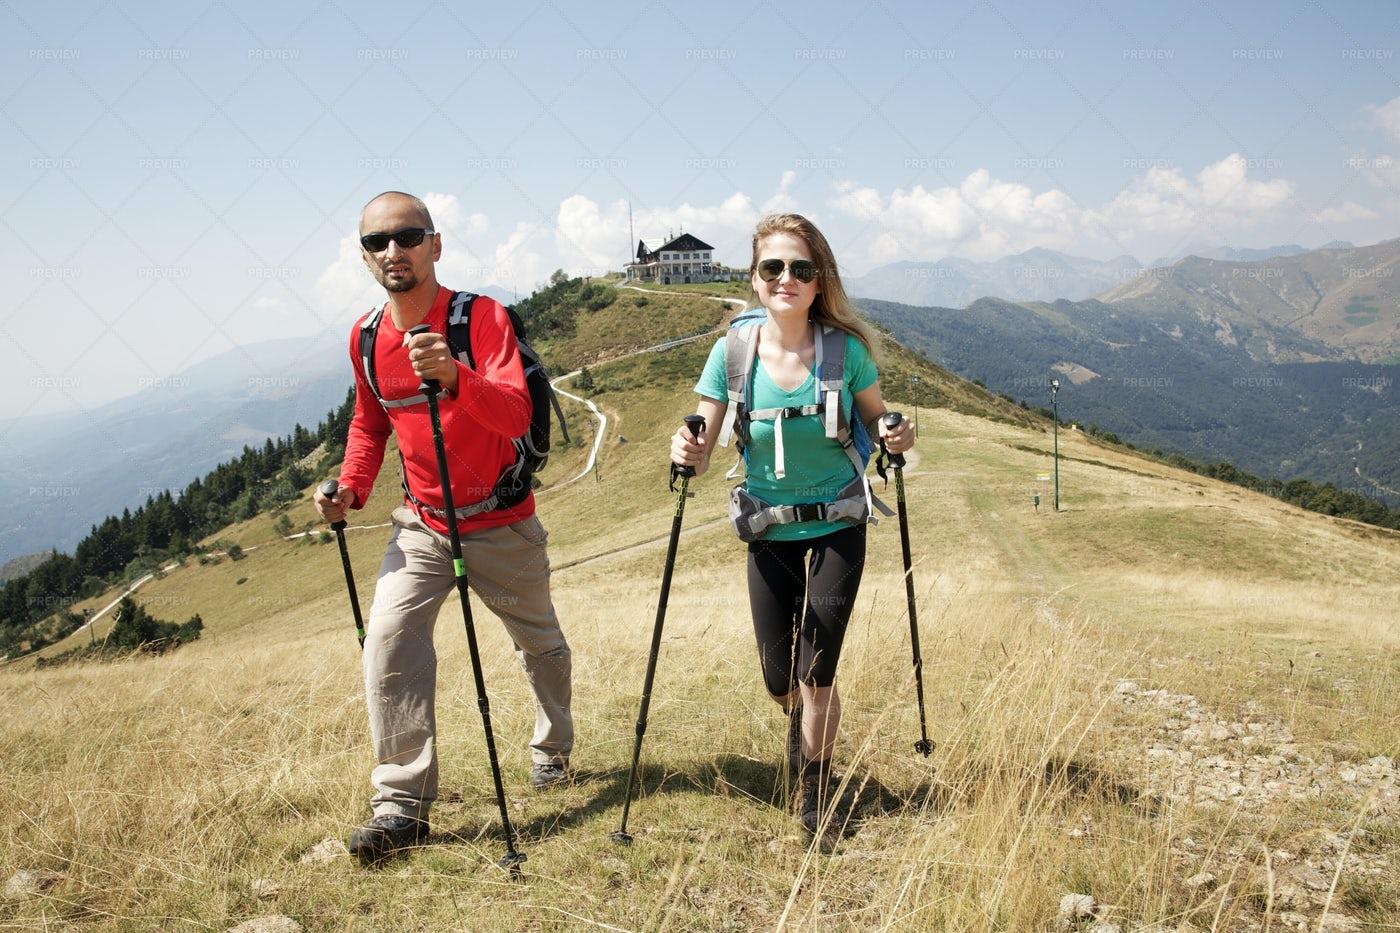 Hiking A Trail: Stock Photos